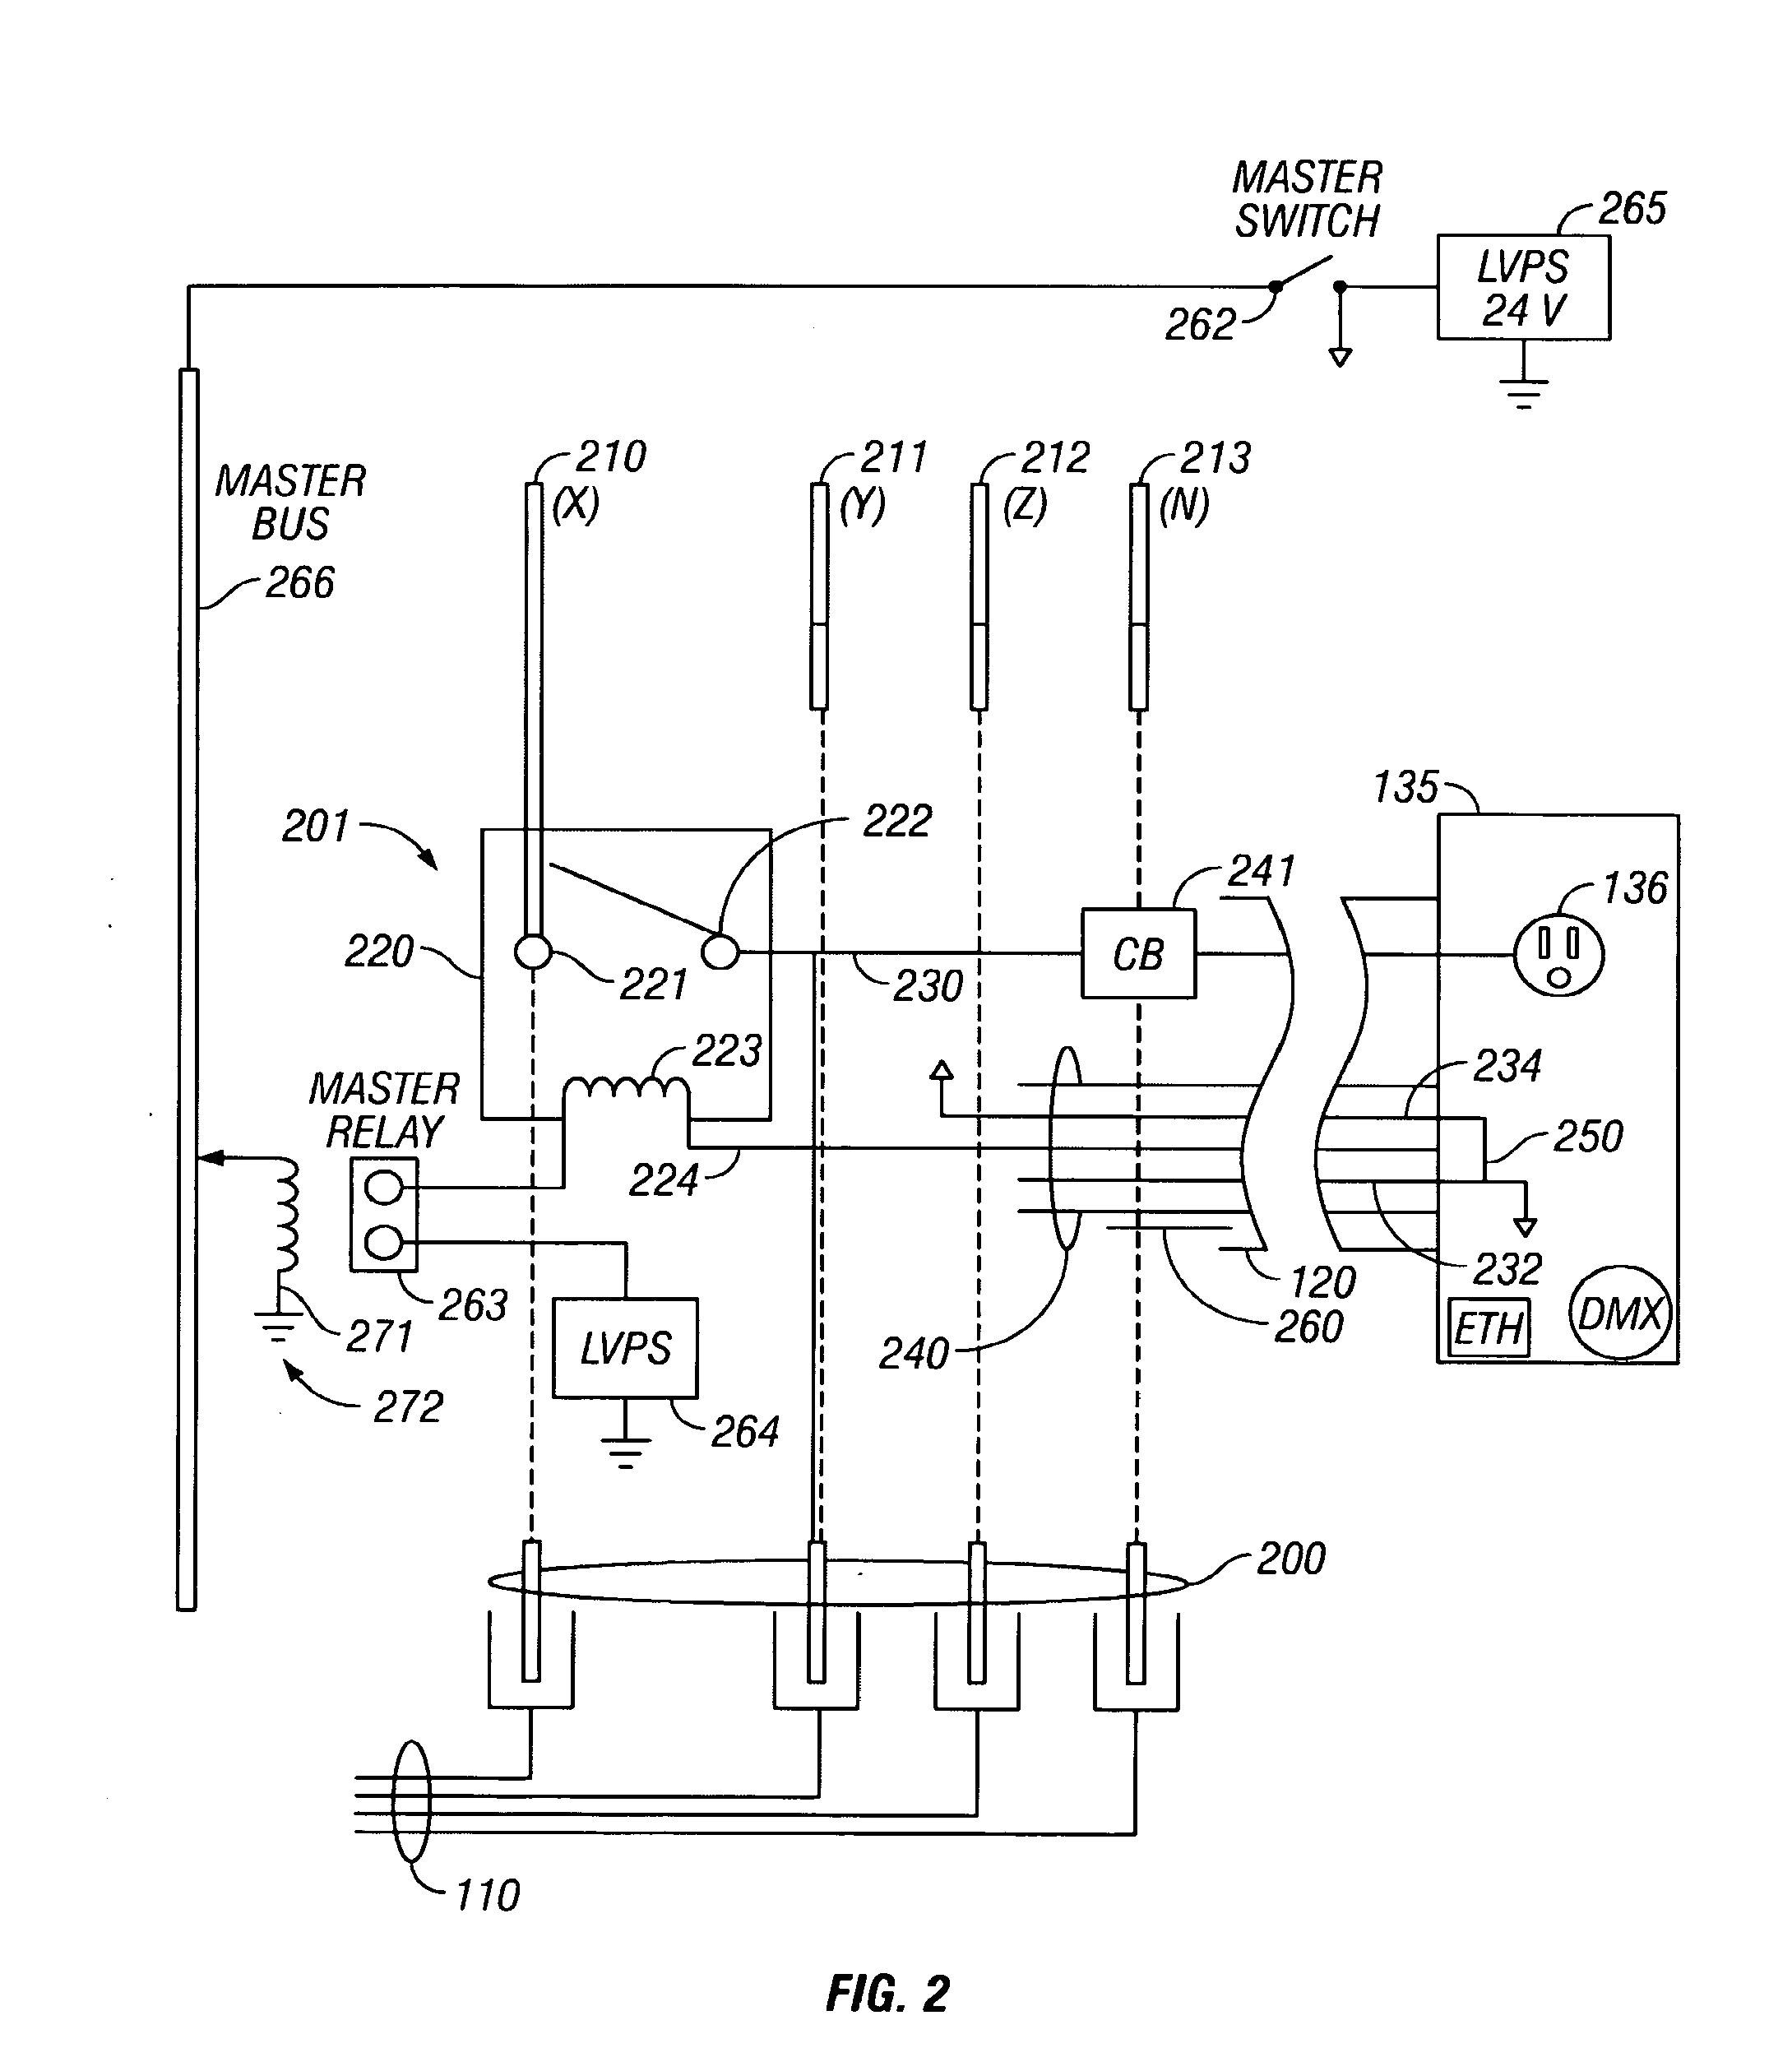 asco 940 wiring diagram wiring diagram het asco wiring diagram motor control